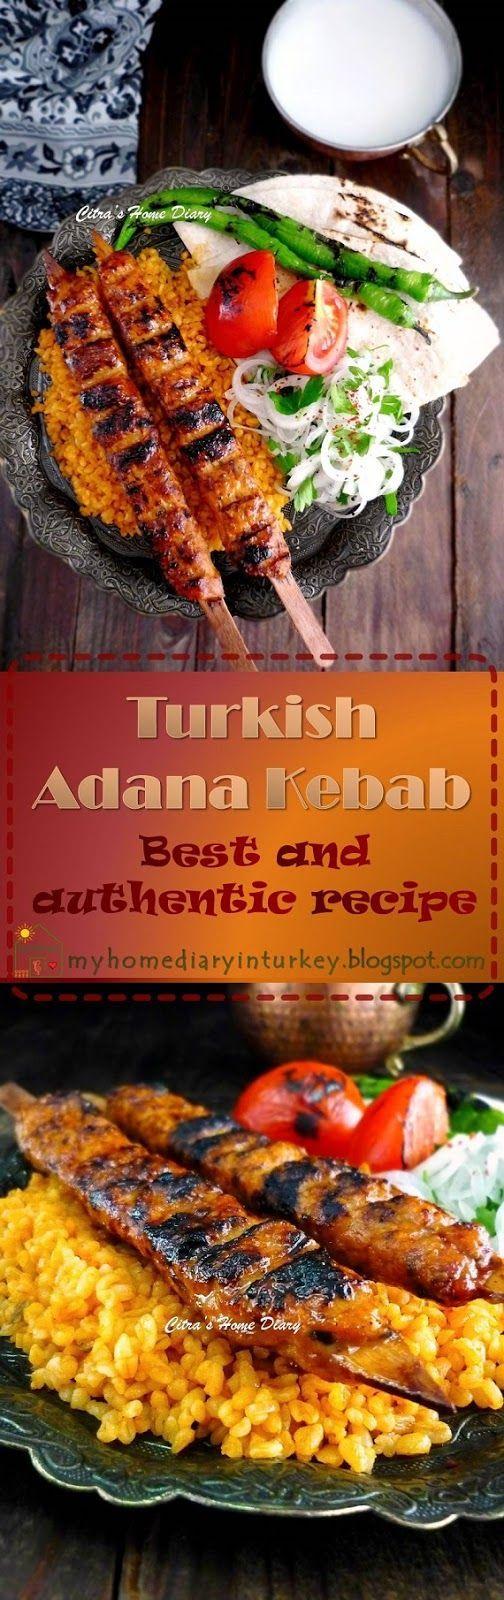 Turkish Adana Kebab